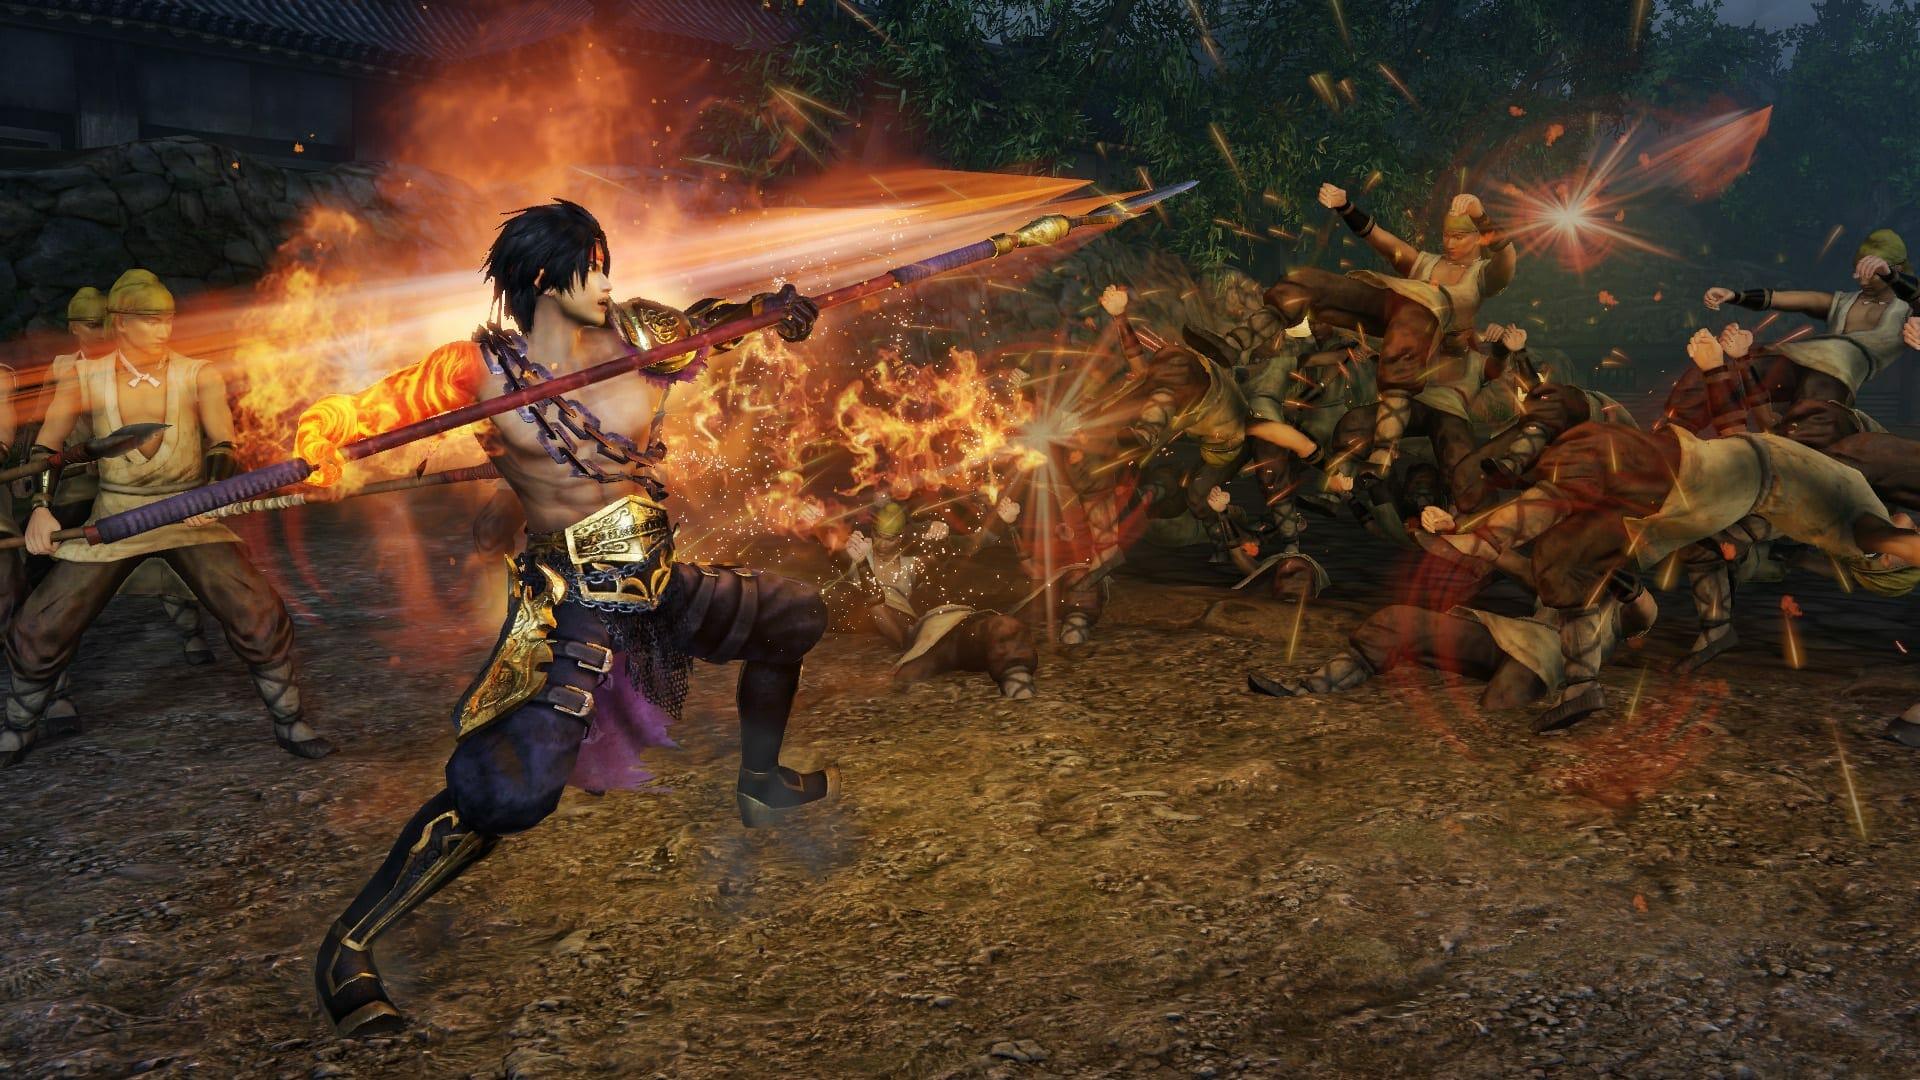 In-game screenshot of Warrior_Orochi 4